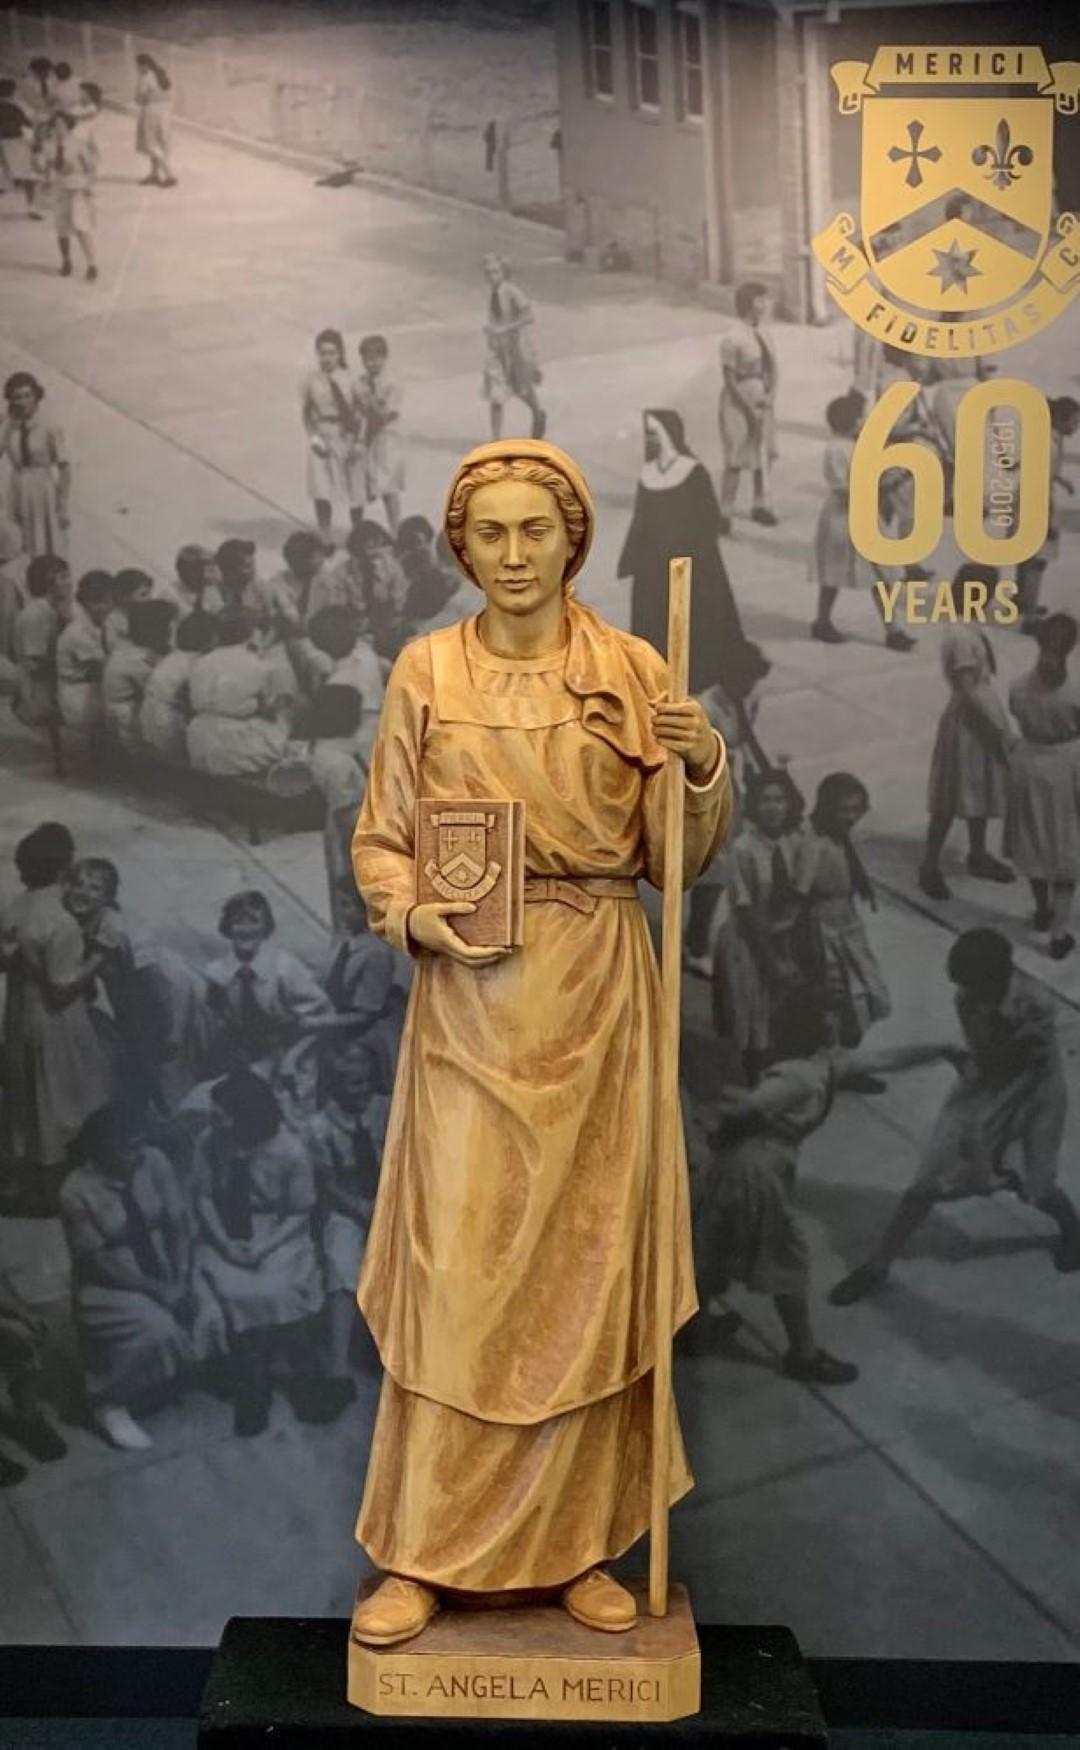 St Angela Merici statue